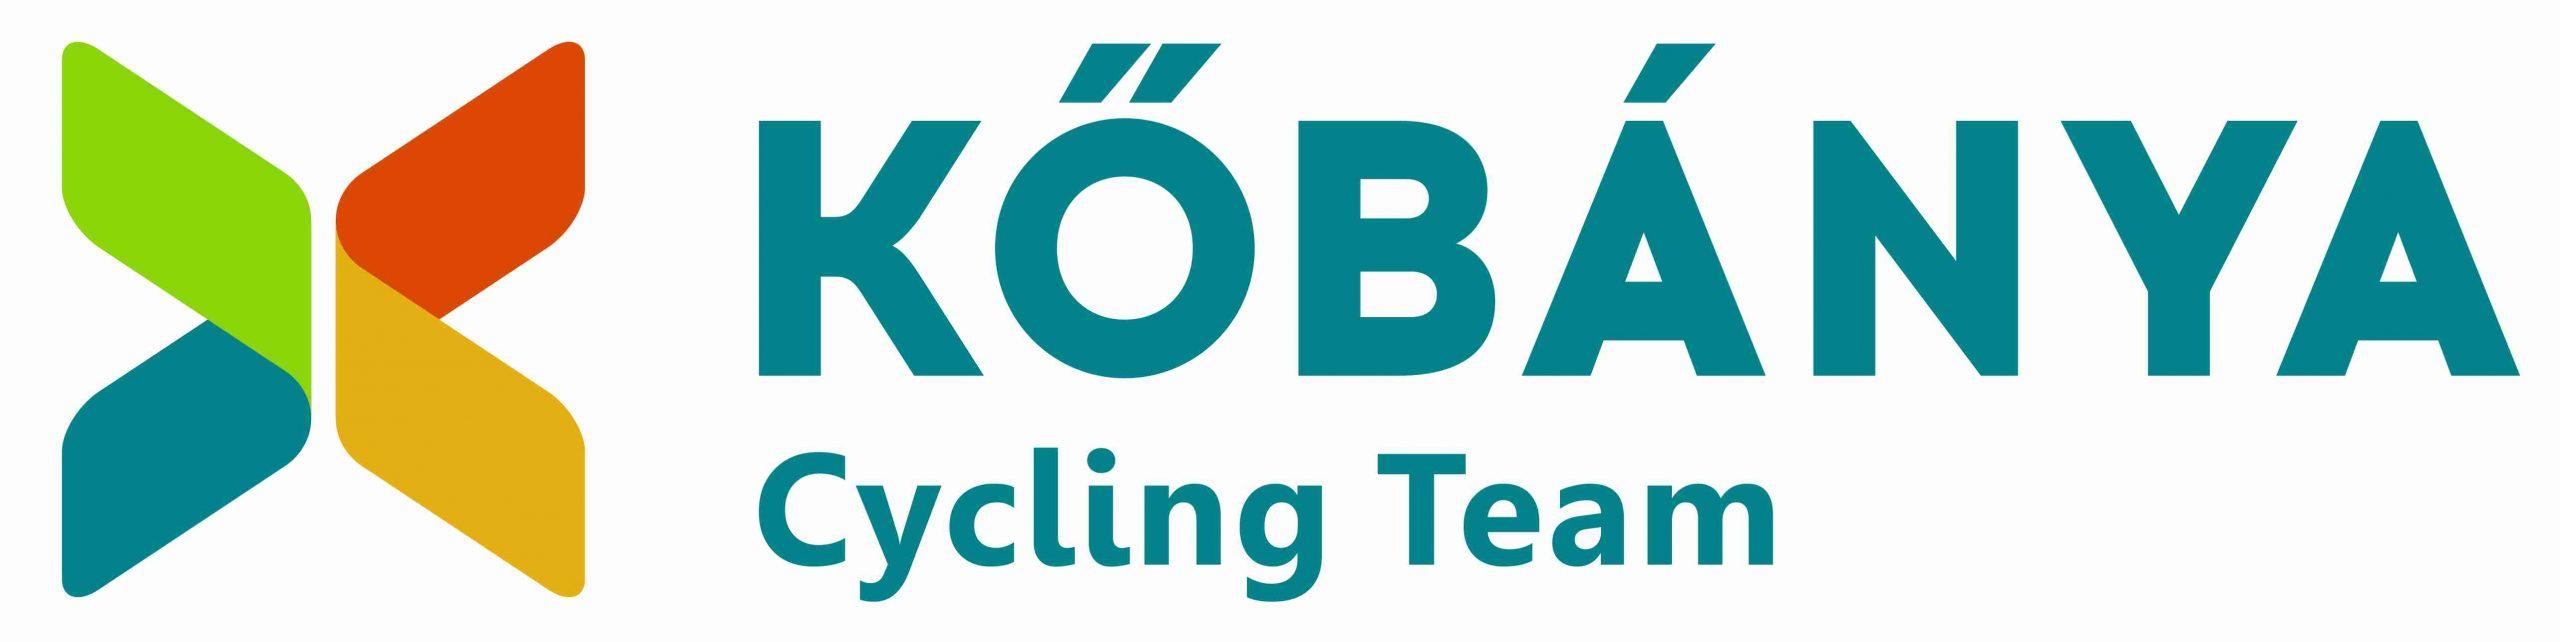 Kobanya Cycling Team logo